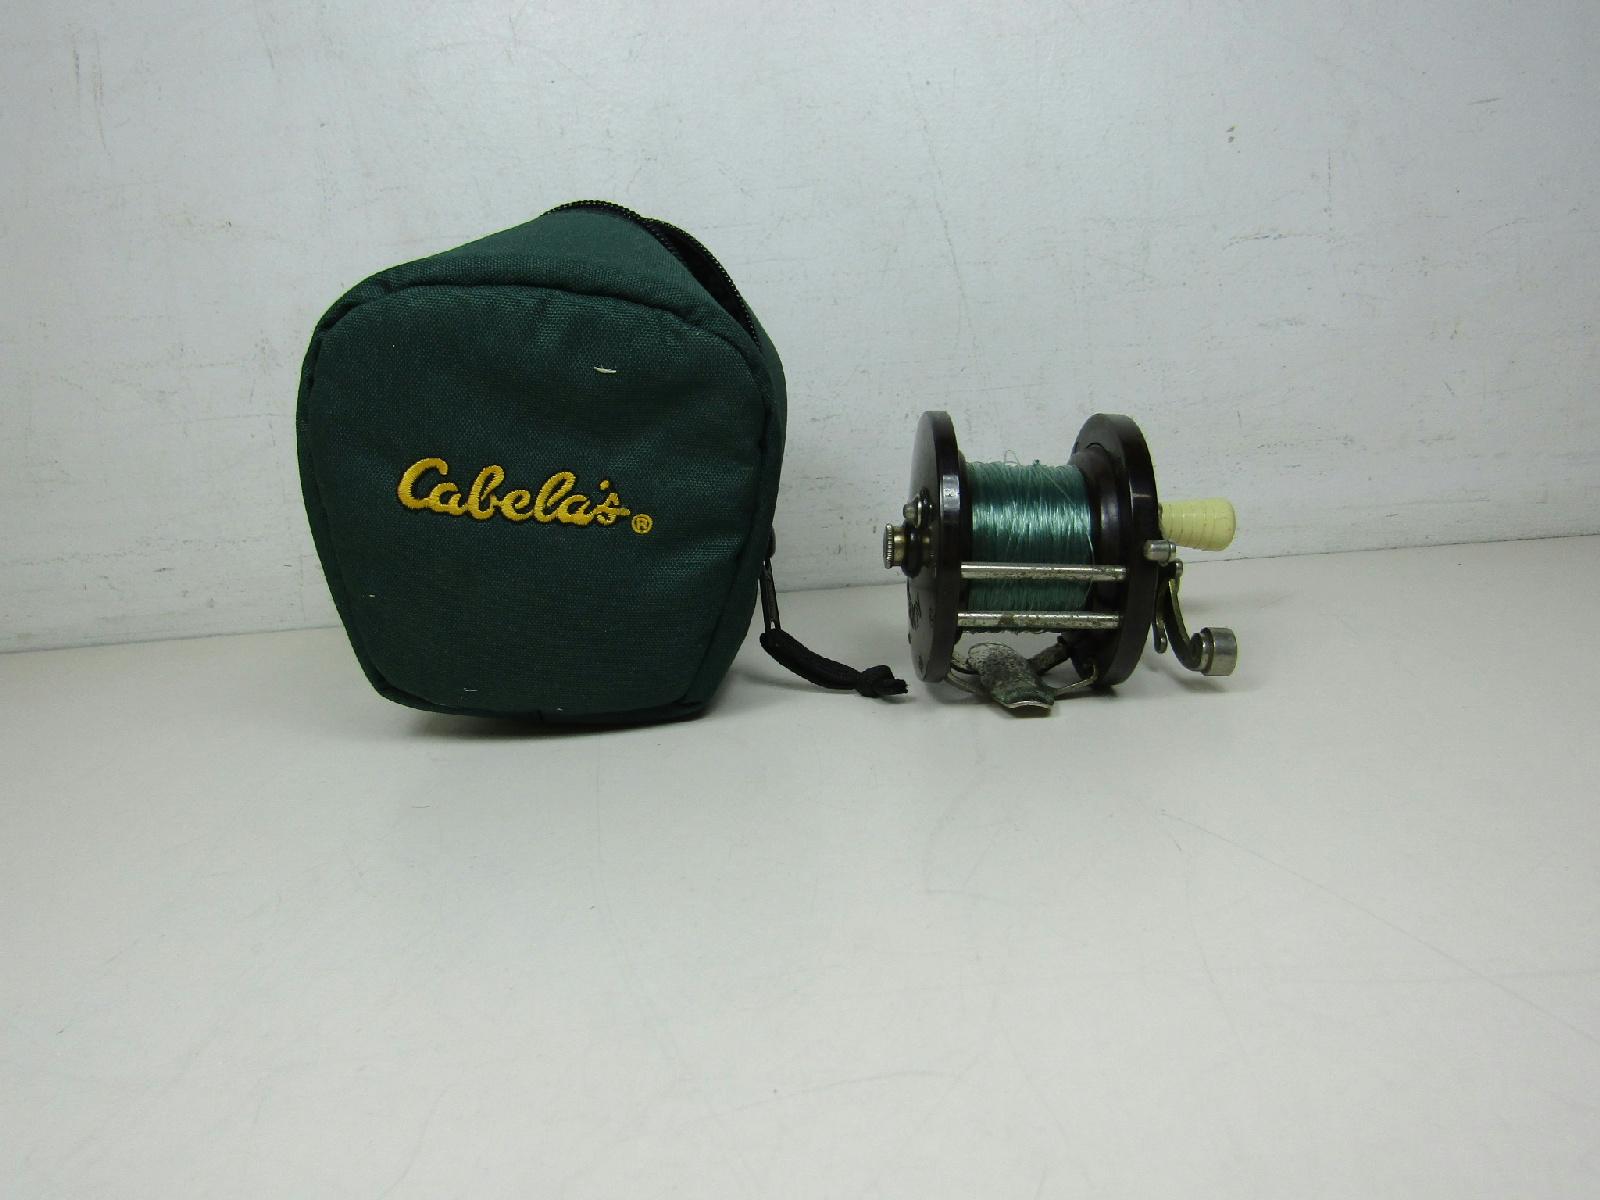 Penn no 85 fishing reel with line cabela 39 s bag ebay for Cabela s fishing line